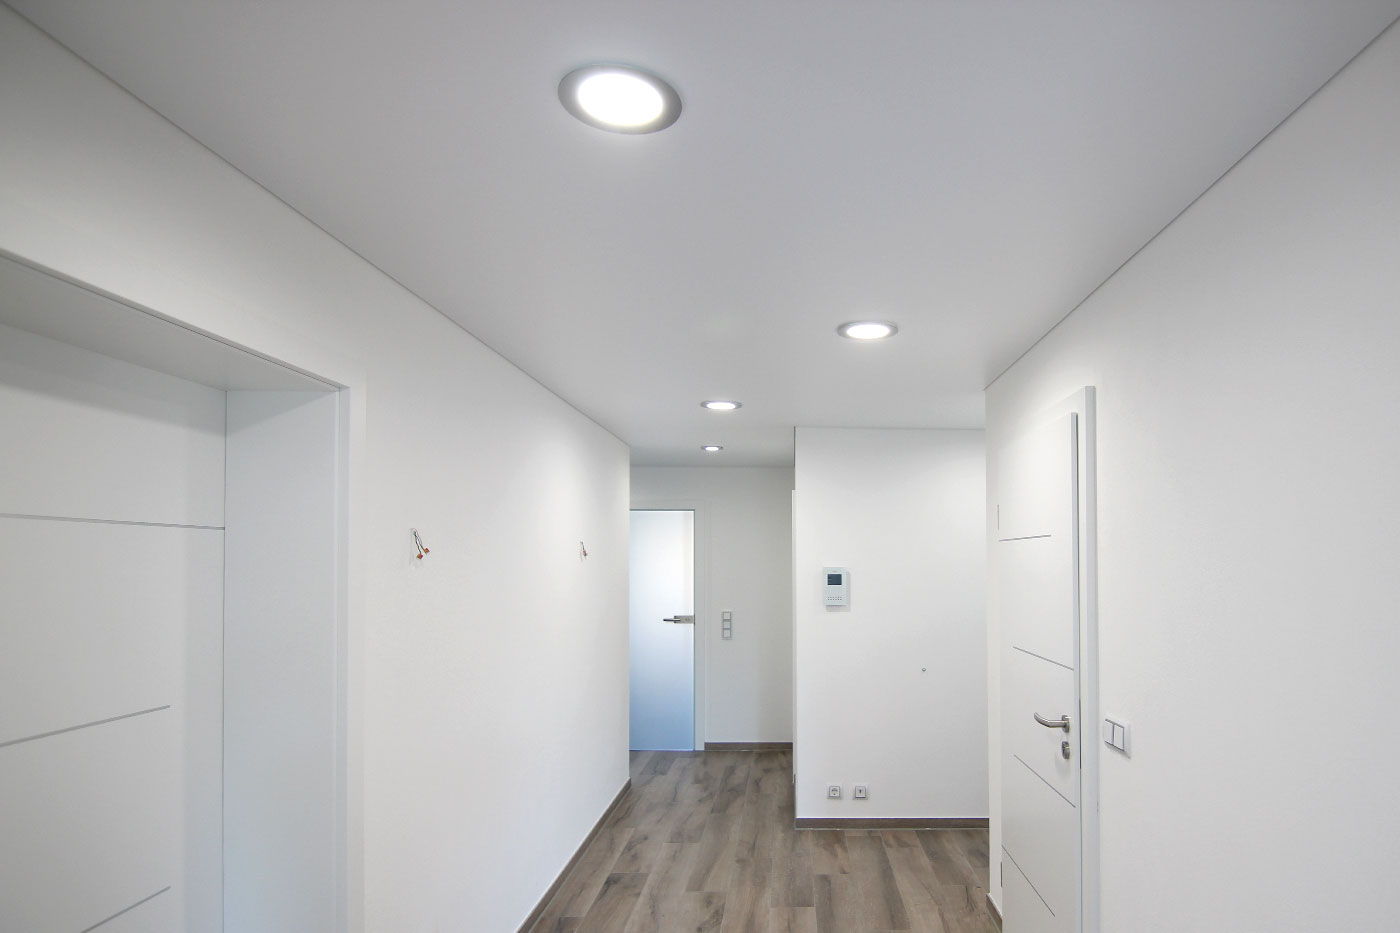 Spanndeckenstudio Teller - Beleuchtung - LED-Glaspanels